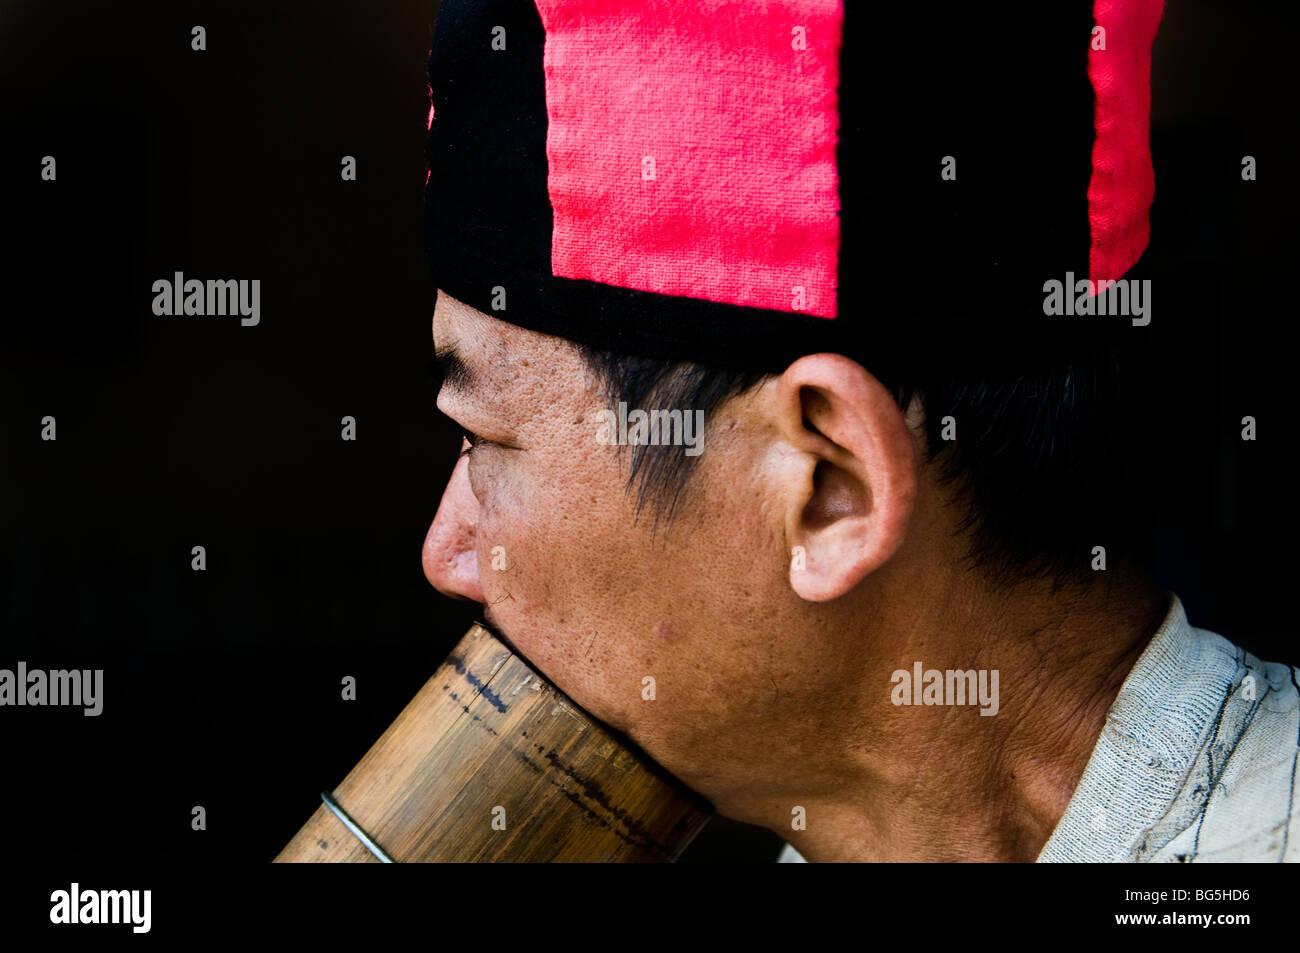 Vietnam Man Profile Immagini   Vietnam Man Profile Fotos Stock - Alamy d8dcdeb079cf